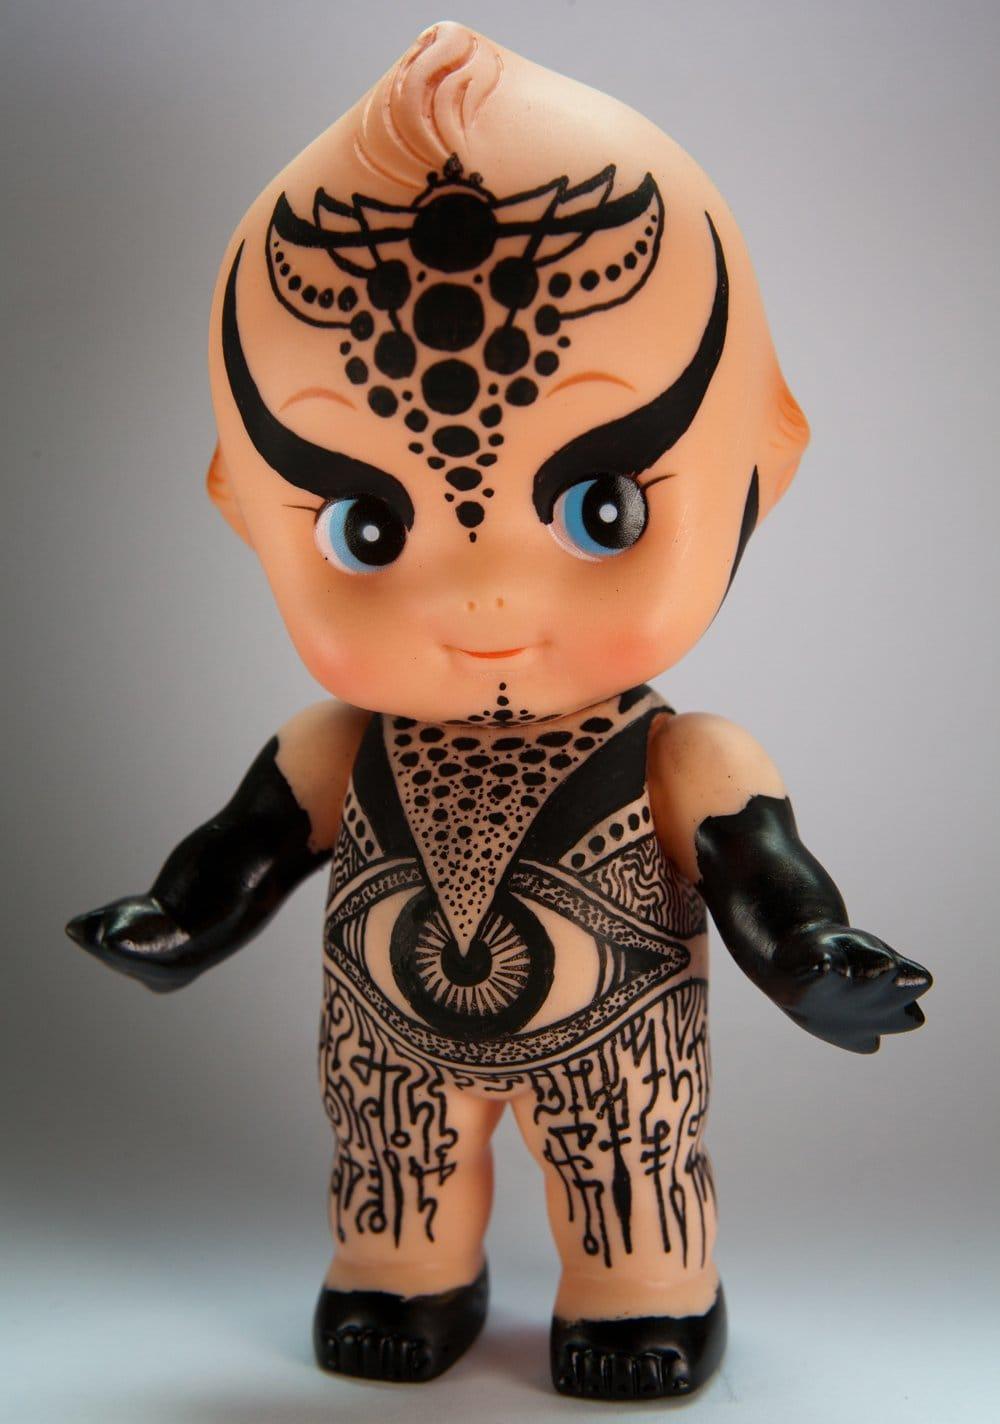 Miniature Ink Ii: Tattoo Artists Customize Kewpie Dolls For Good Cause